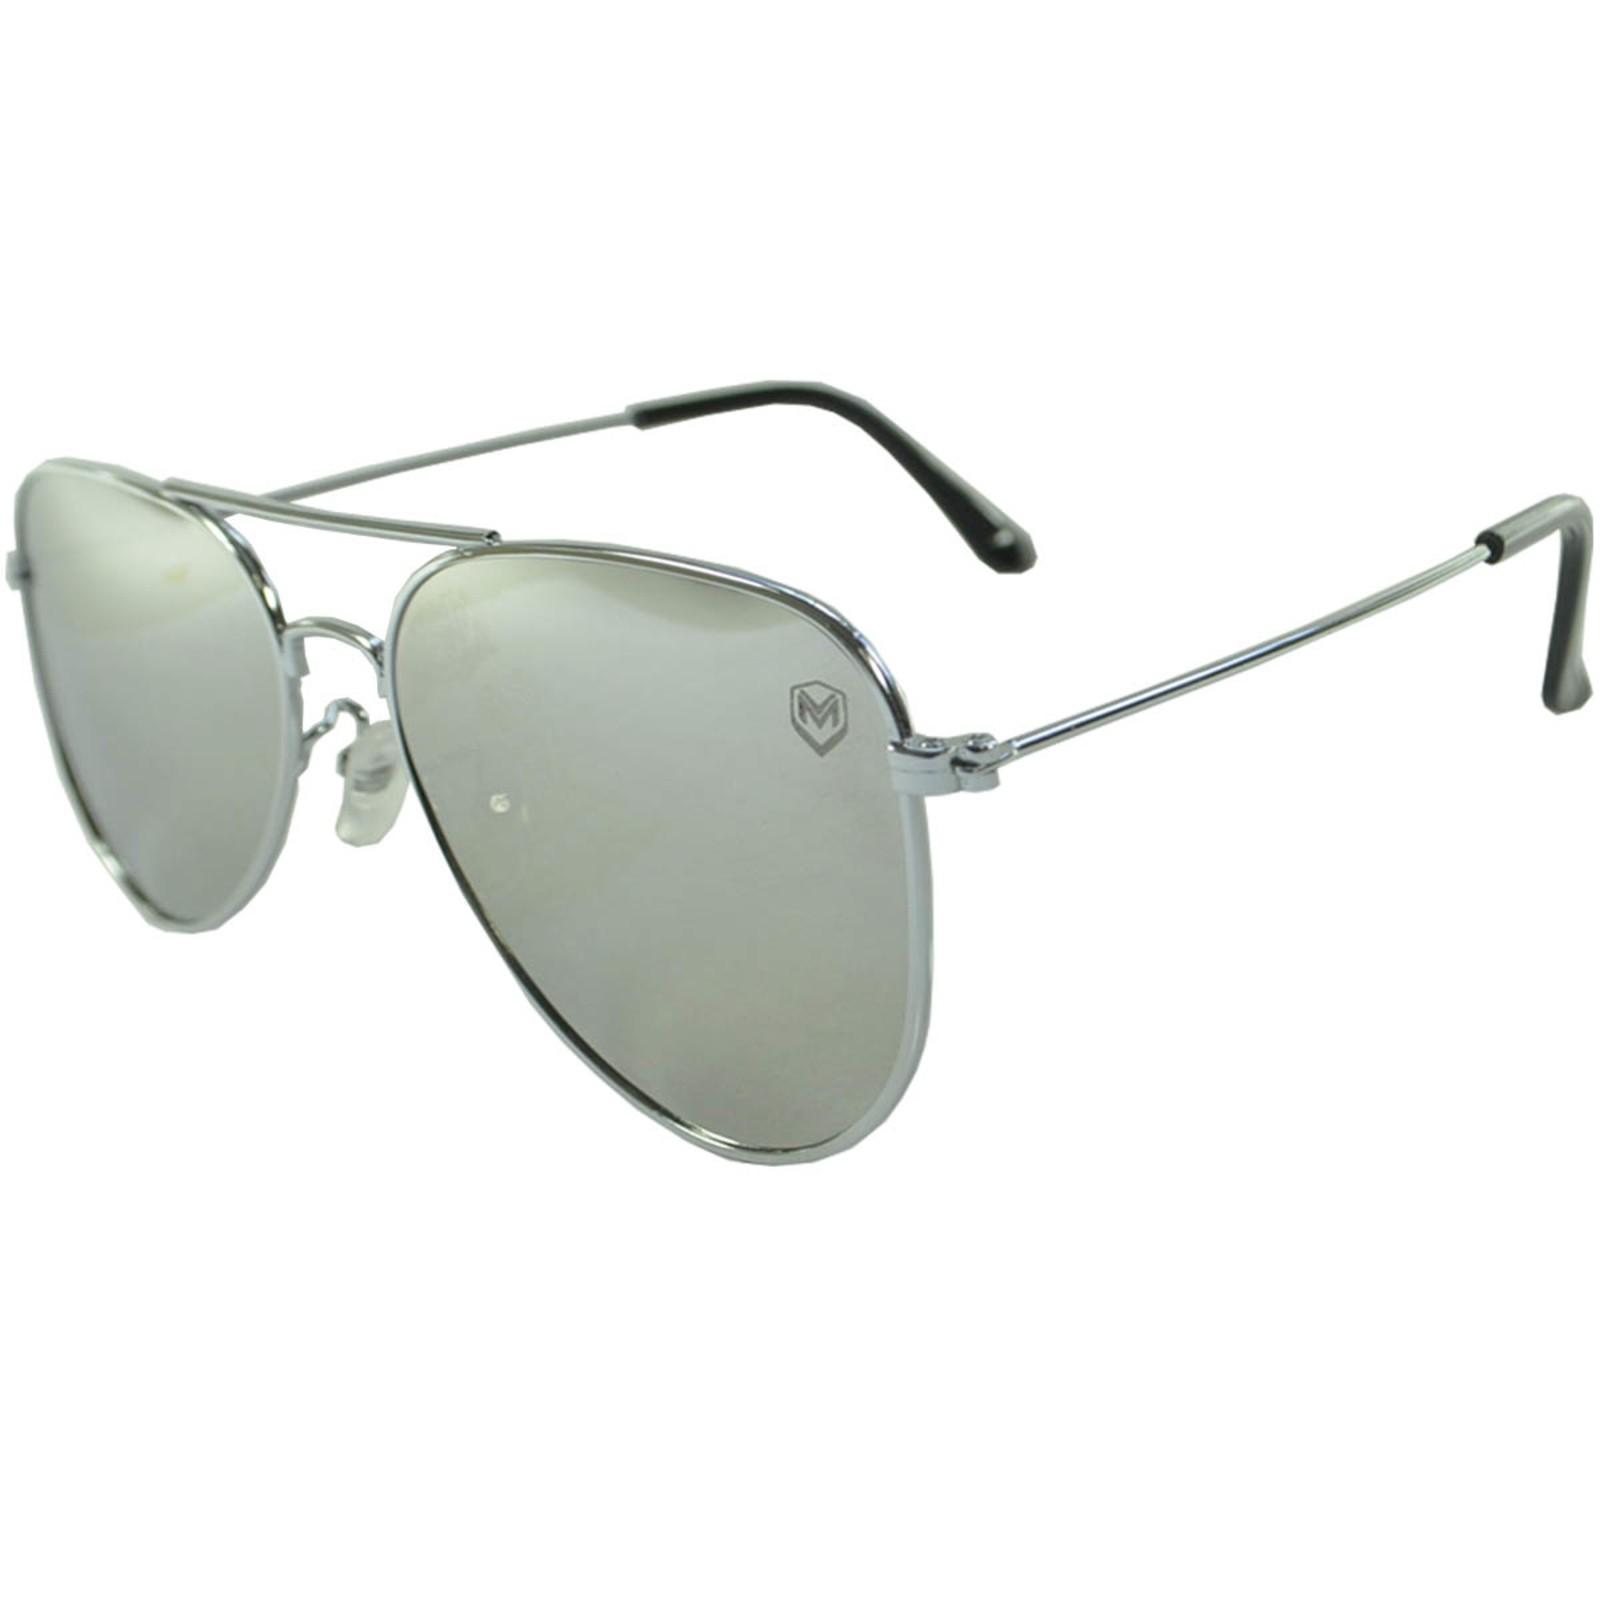 Óculos De Sol Mackage Unissex Metal Aviador Clássico Flat Espelhado - Prata